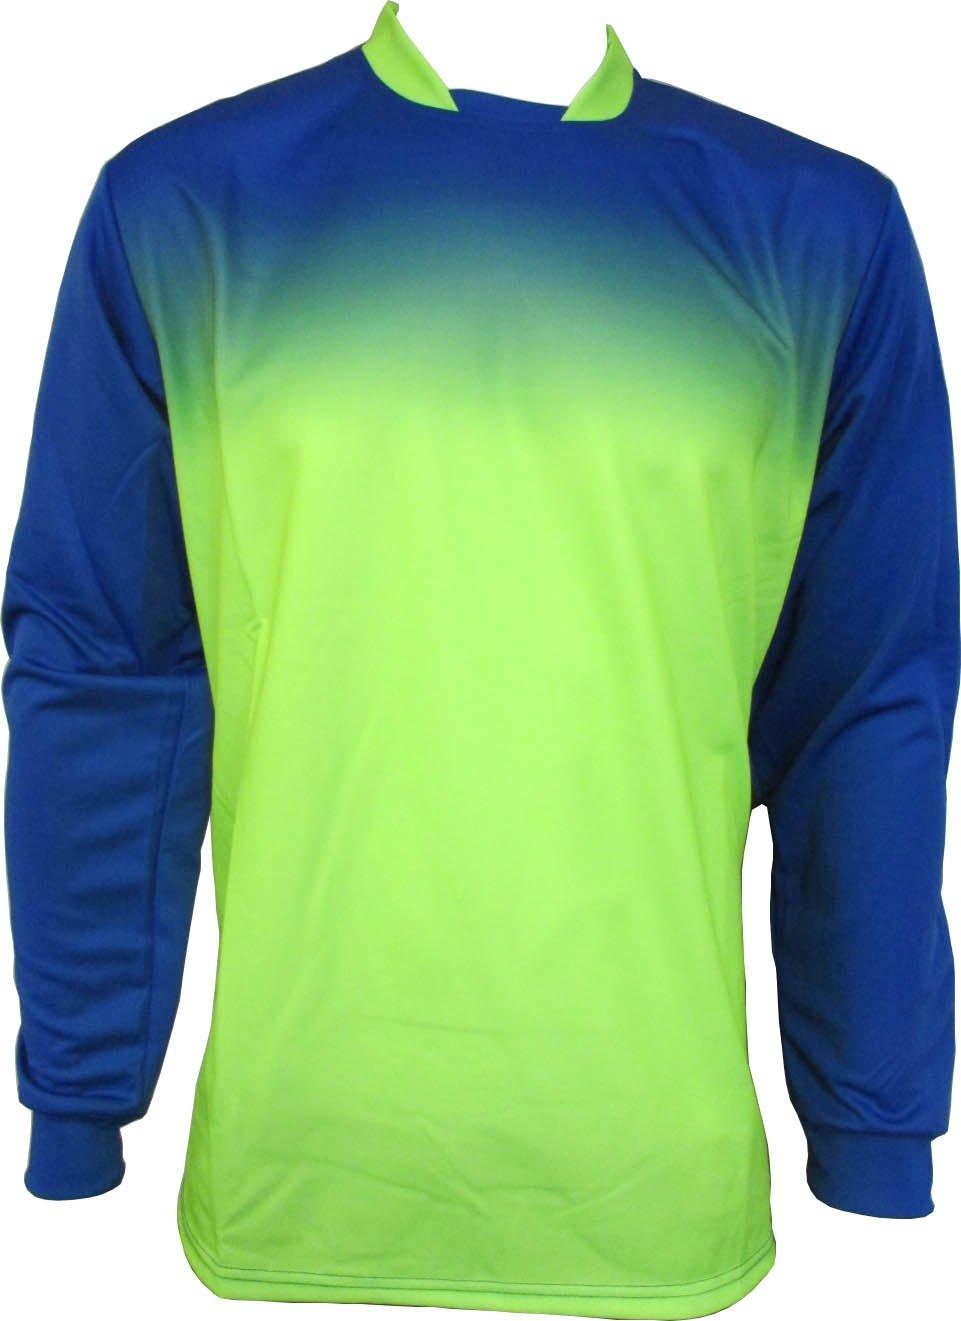 dac00e9162a Amazon.com   Vizari Vallejo Goal Keeper Jersey